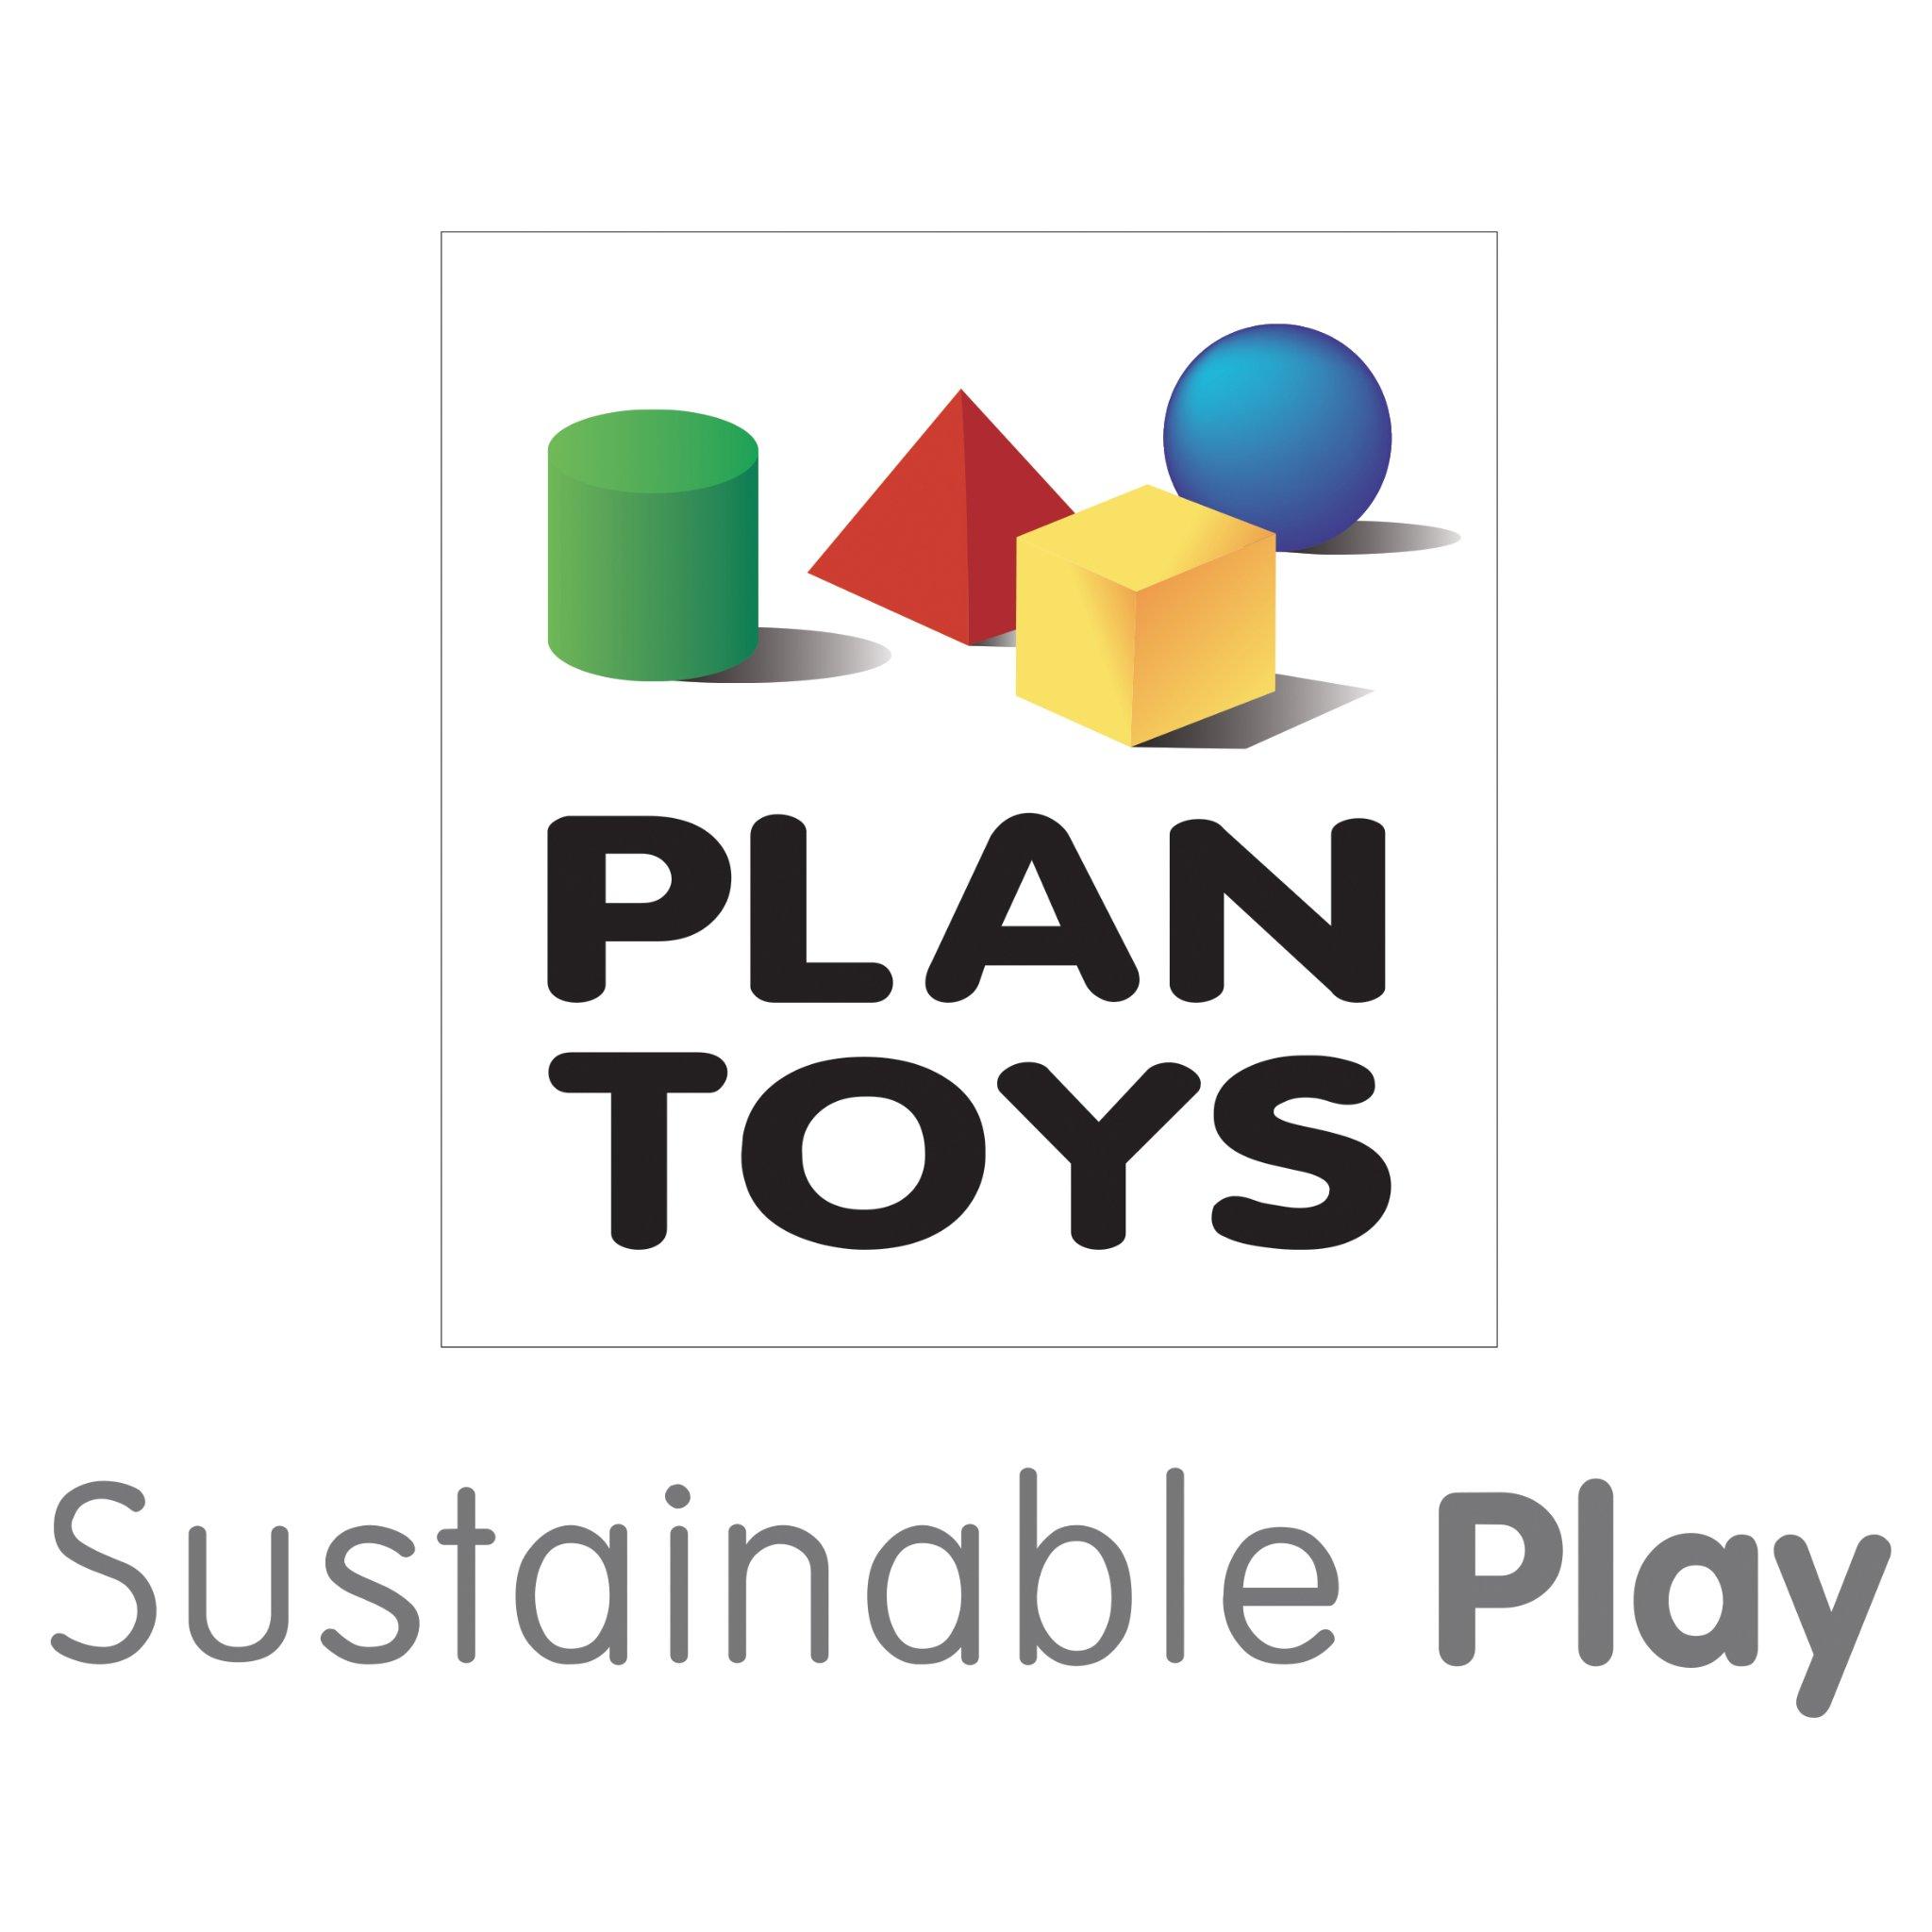 @PlanToys